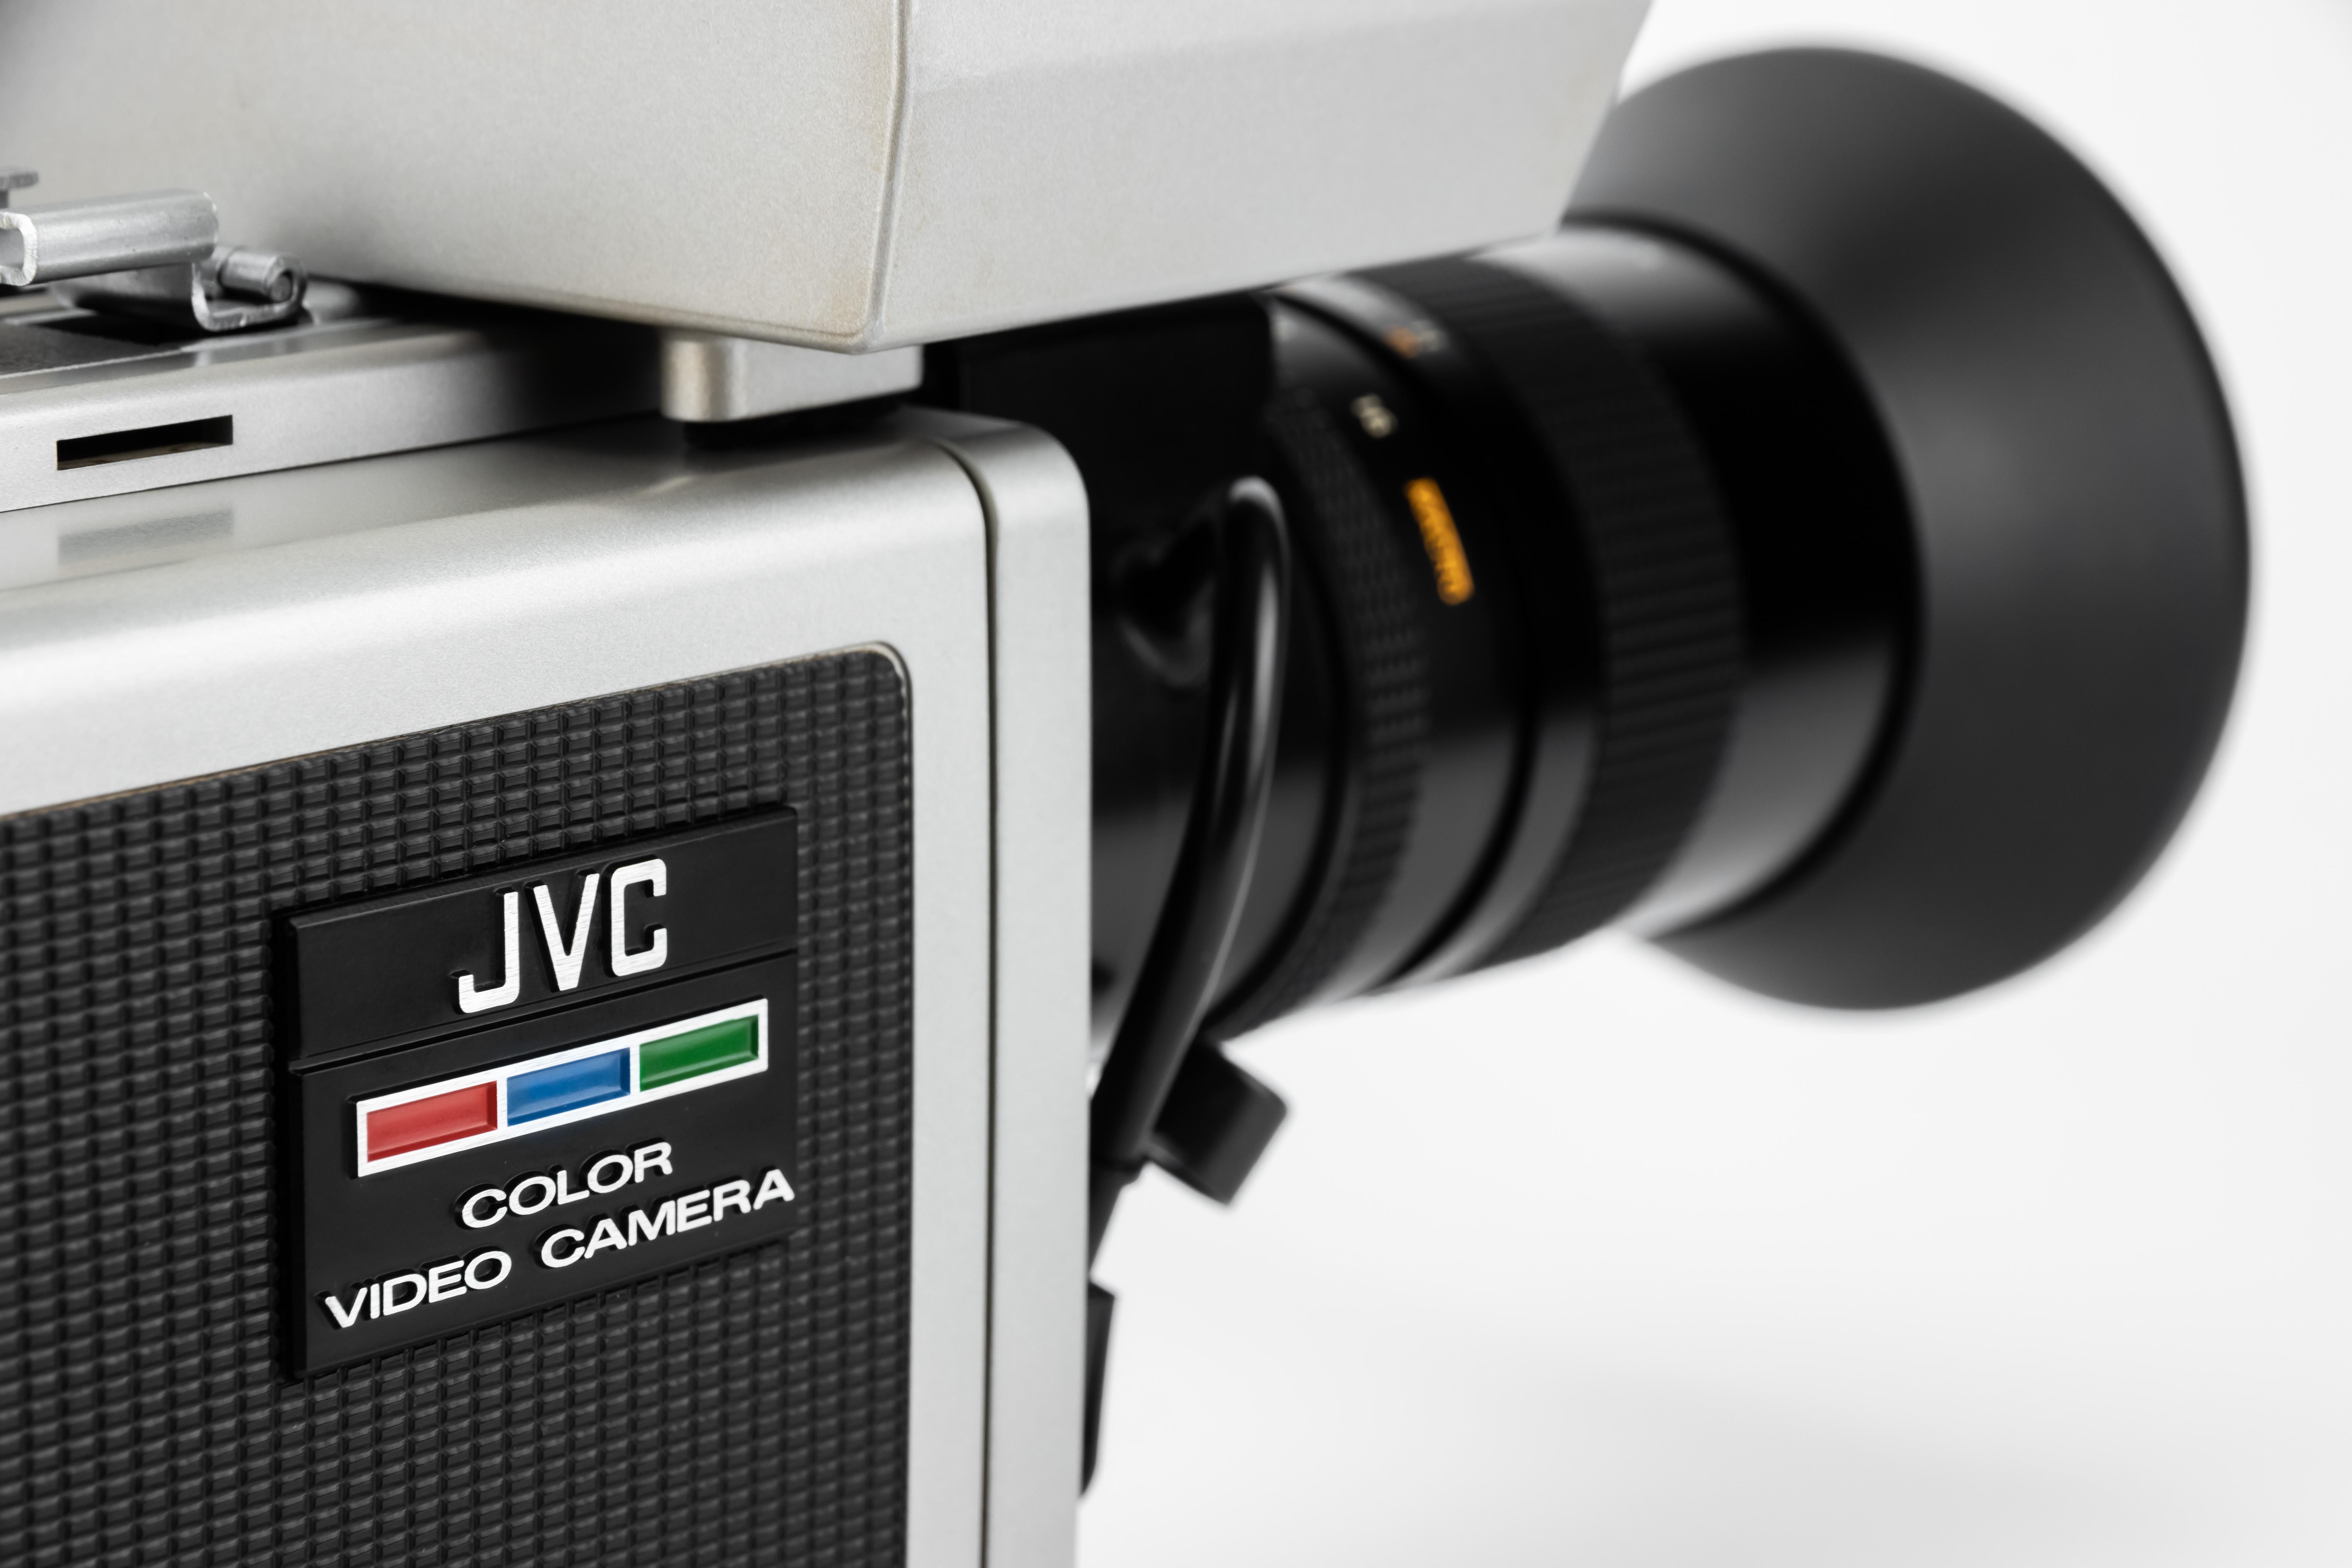 JVC G-71E - 3